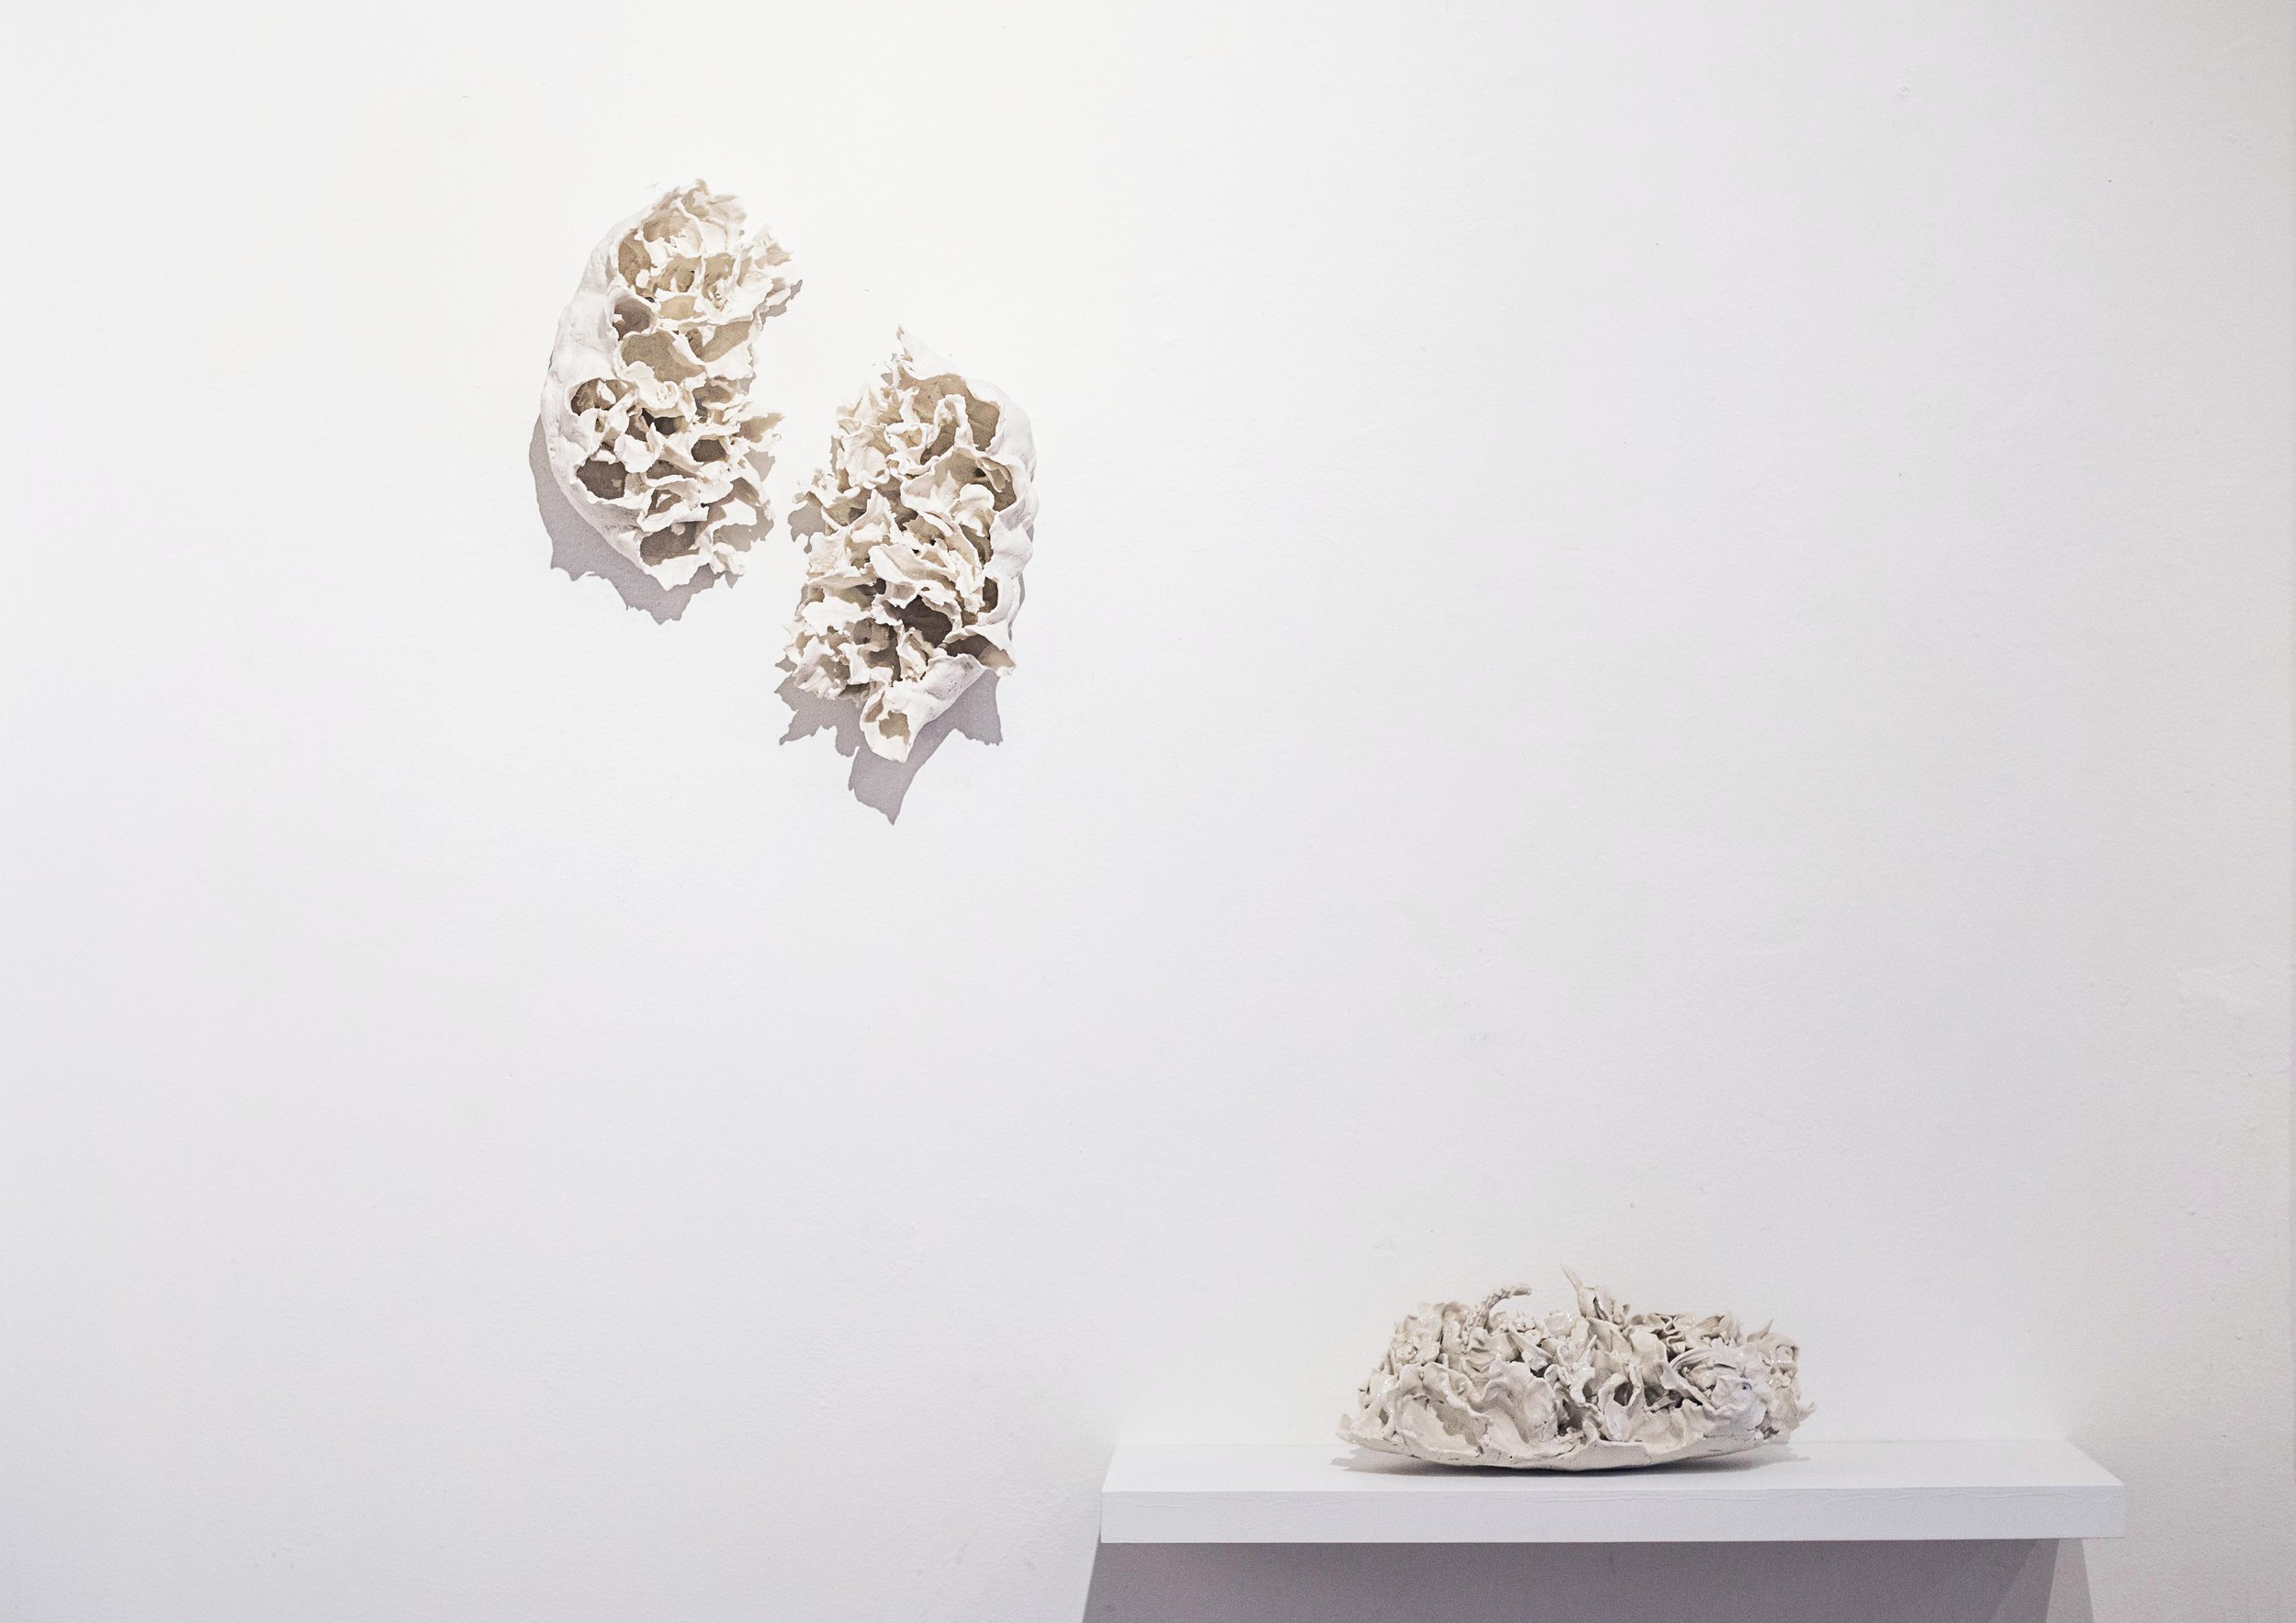 Lan Zhaoxing and Renqian Yang: Between Mountains  installation view, photograph by Nadia Peichao Lin. ©Lan Zhaoxing and Renqian Yang, courtesy Fou Gallery.